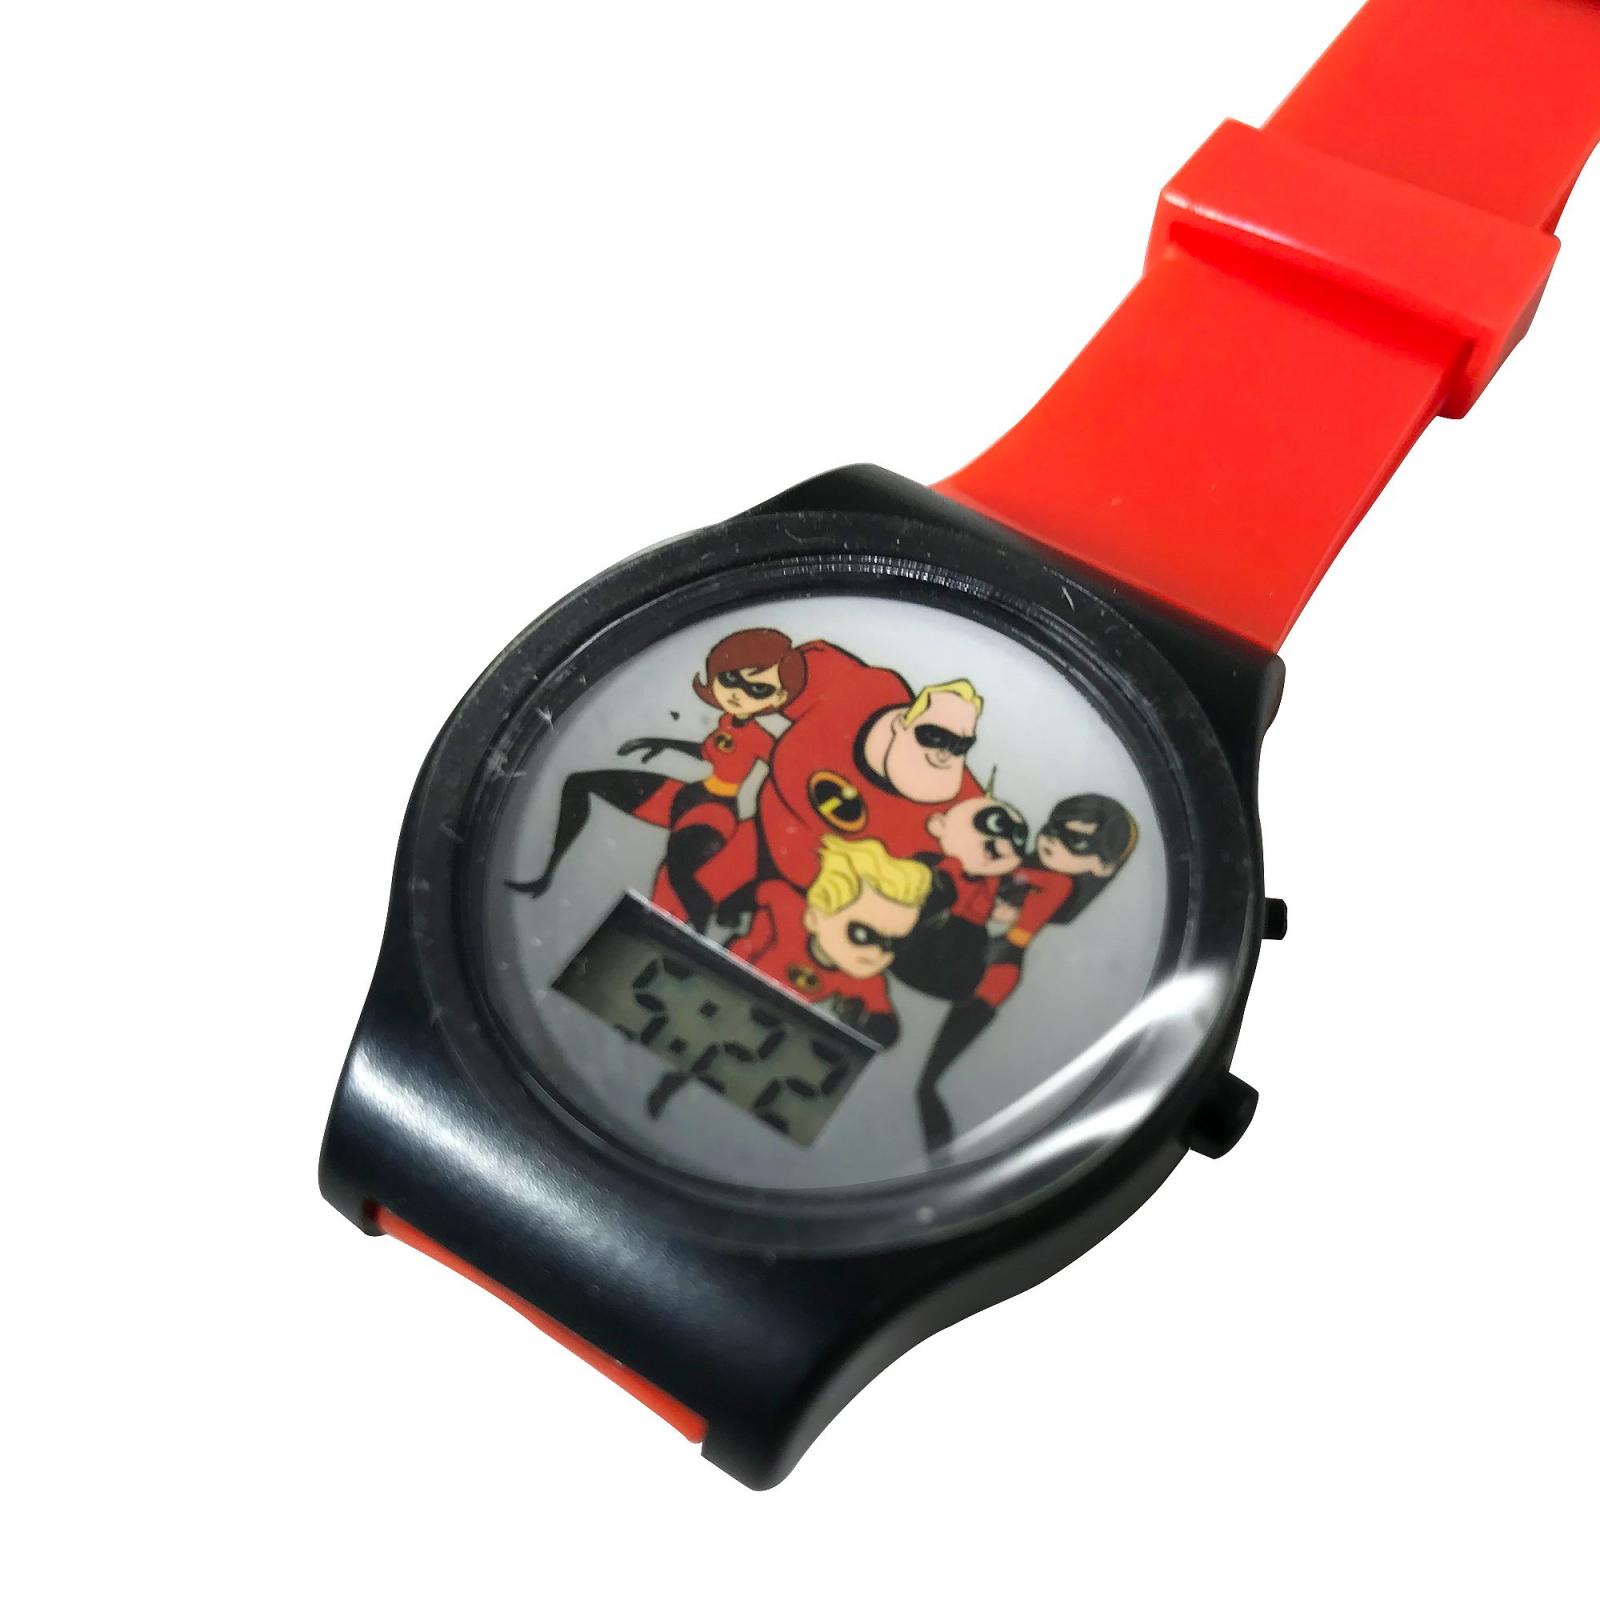 Incredibles 2 Digital LCD Wrist Watch Kids Adjustable Strap